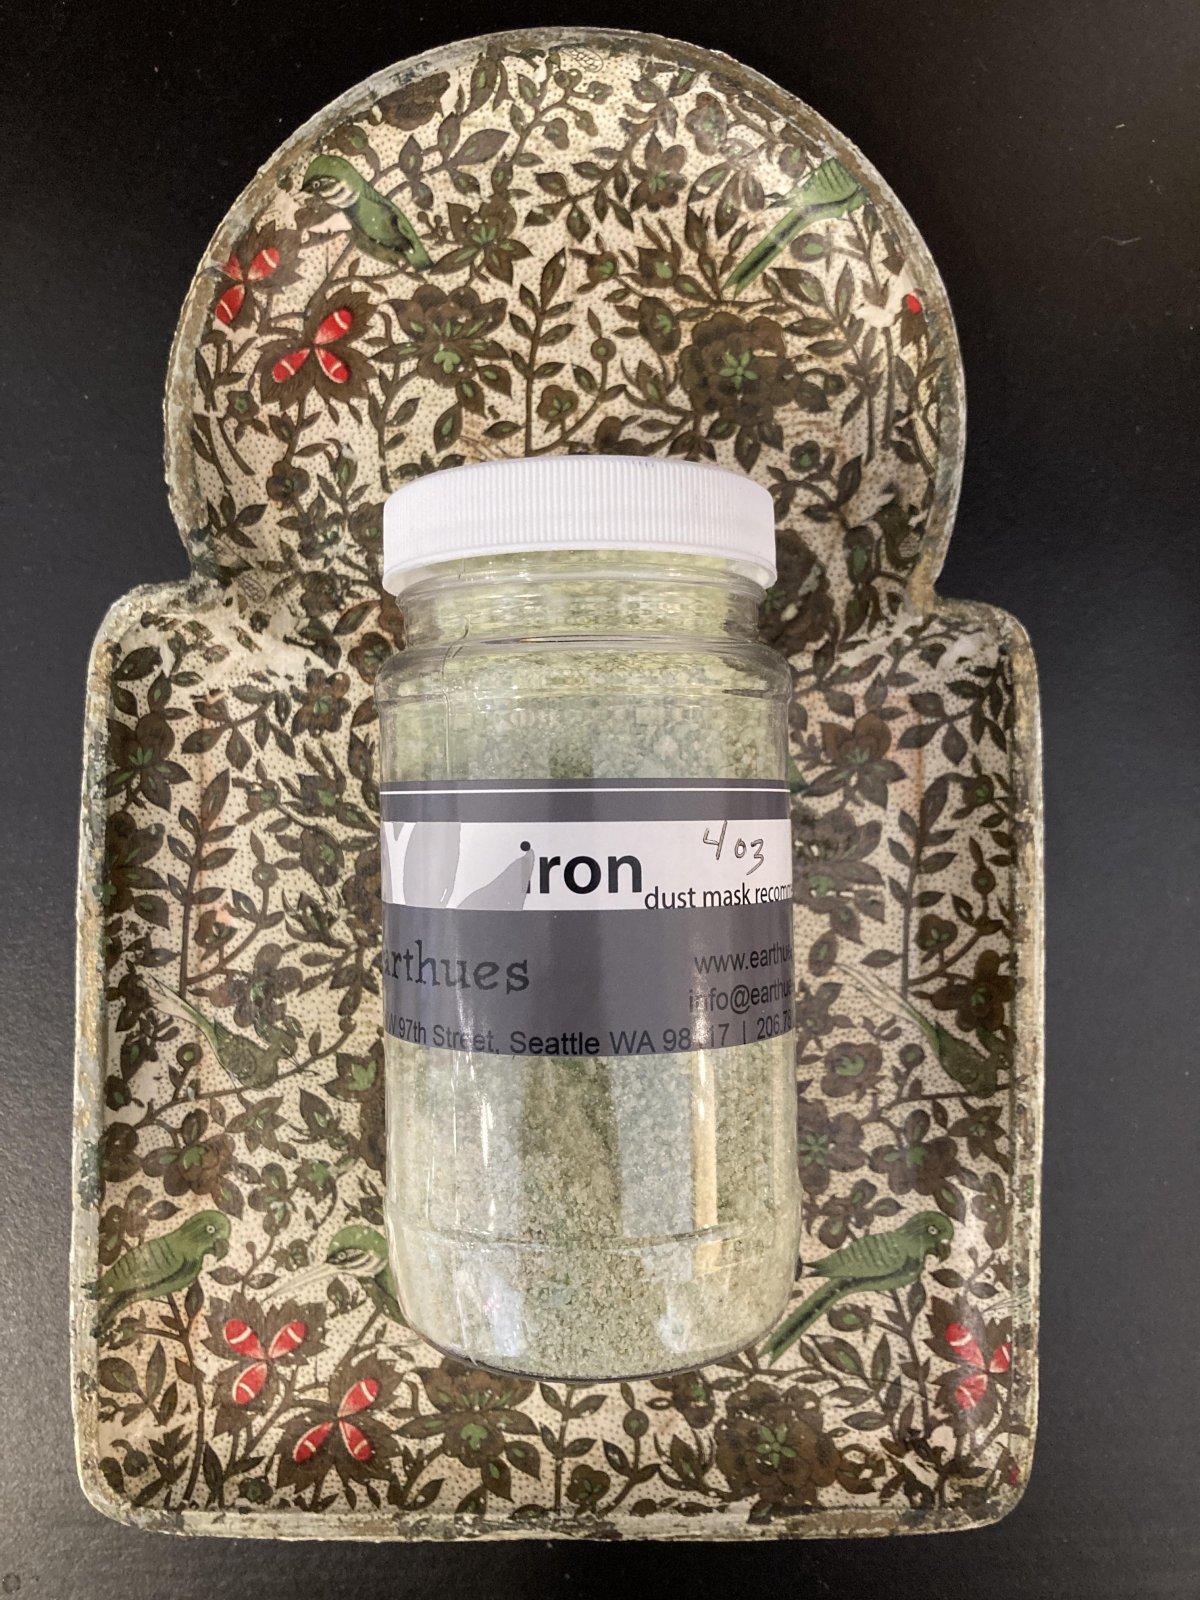 Ferrous Sulfate - Iron - 40z